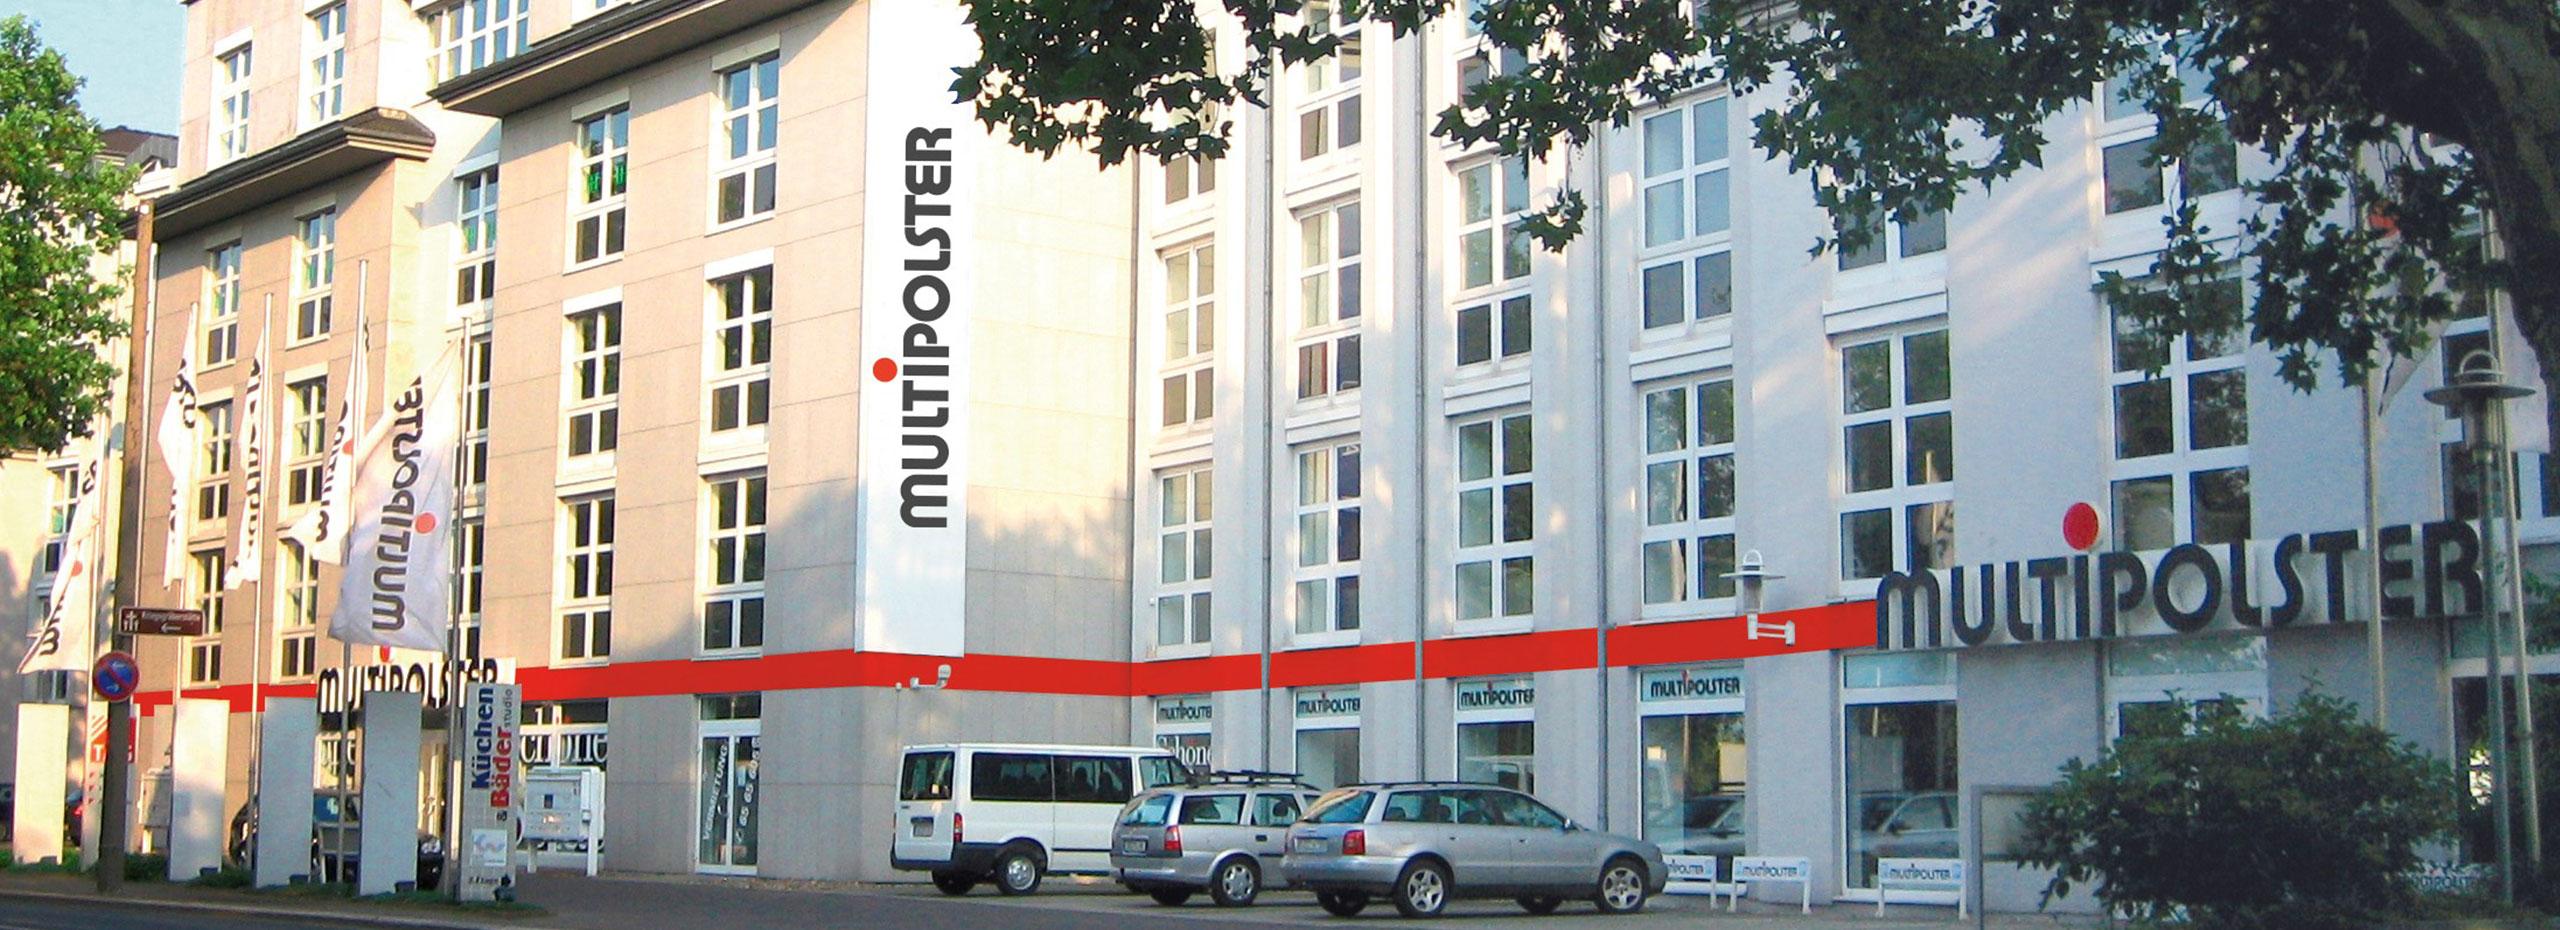 Multipolster - Dresden Friedrichstadt